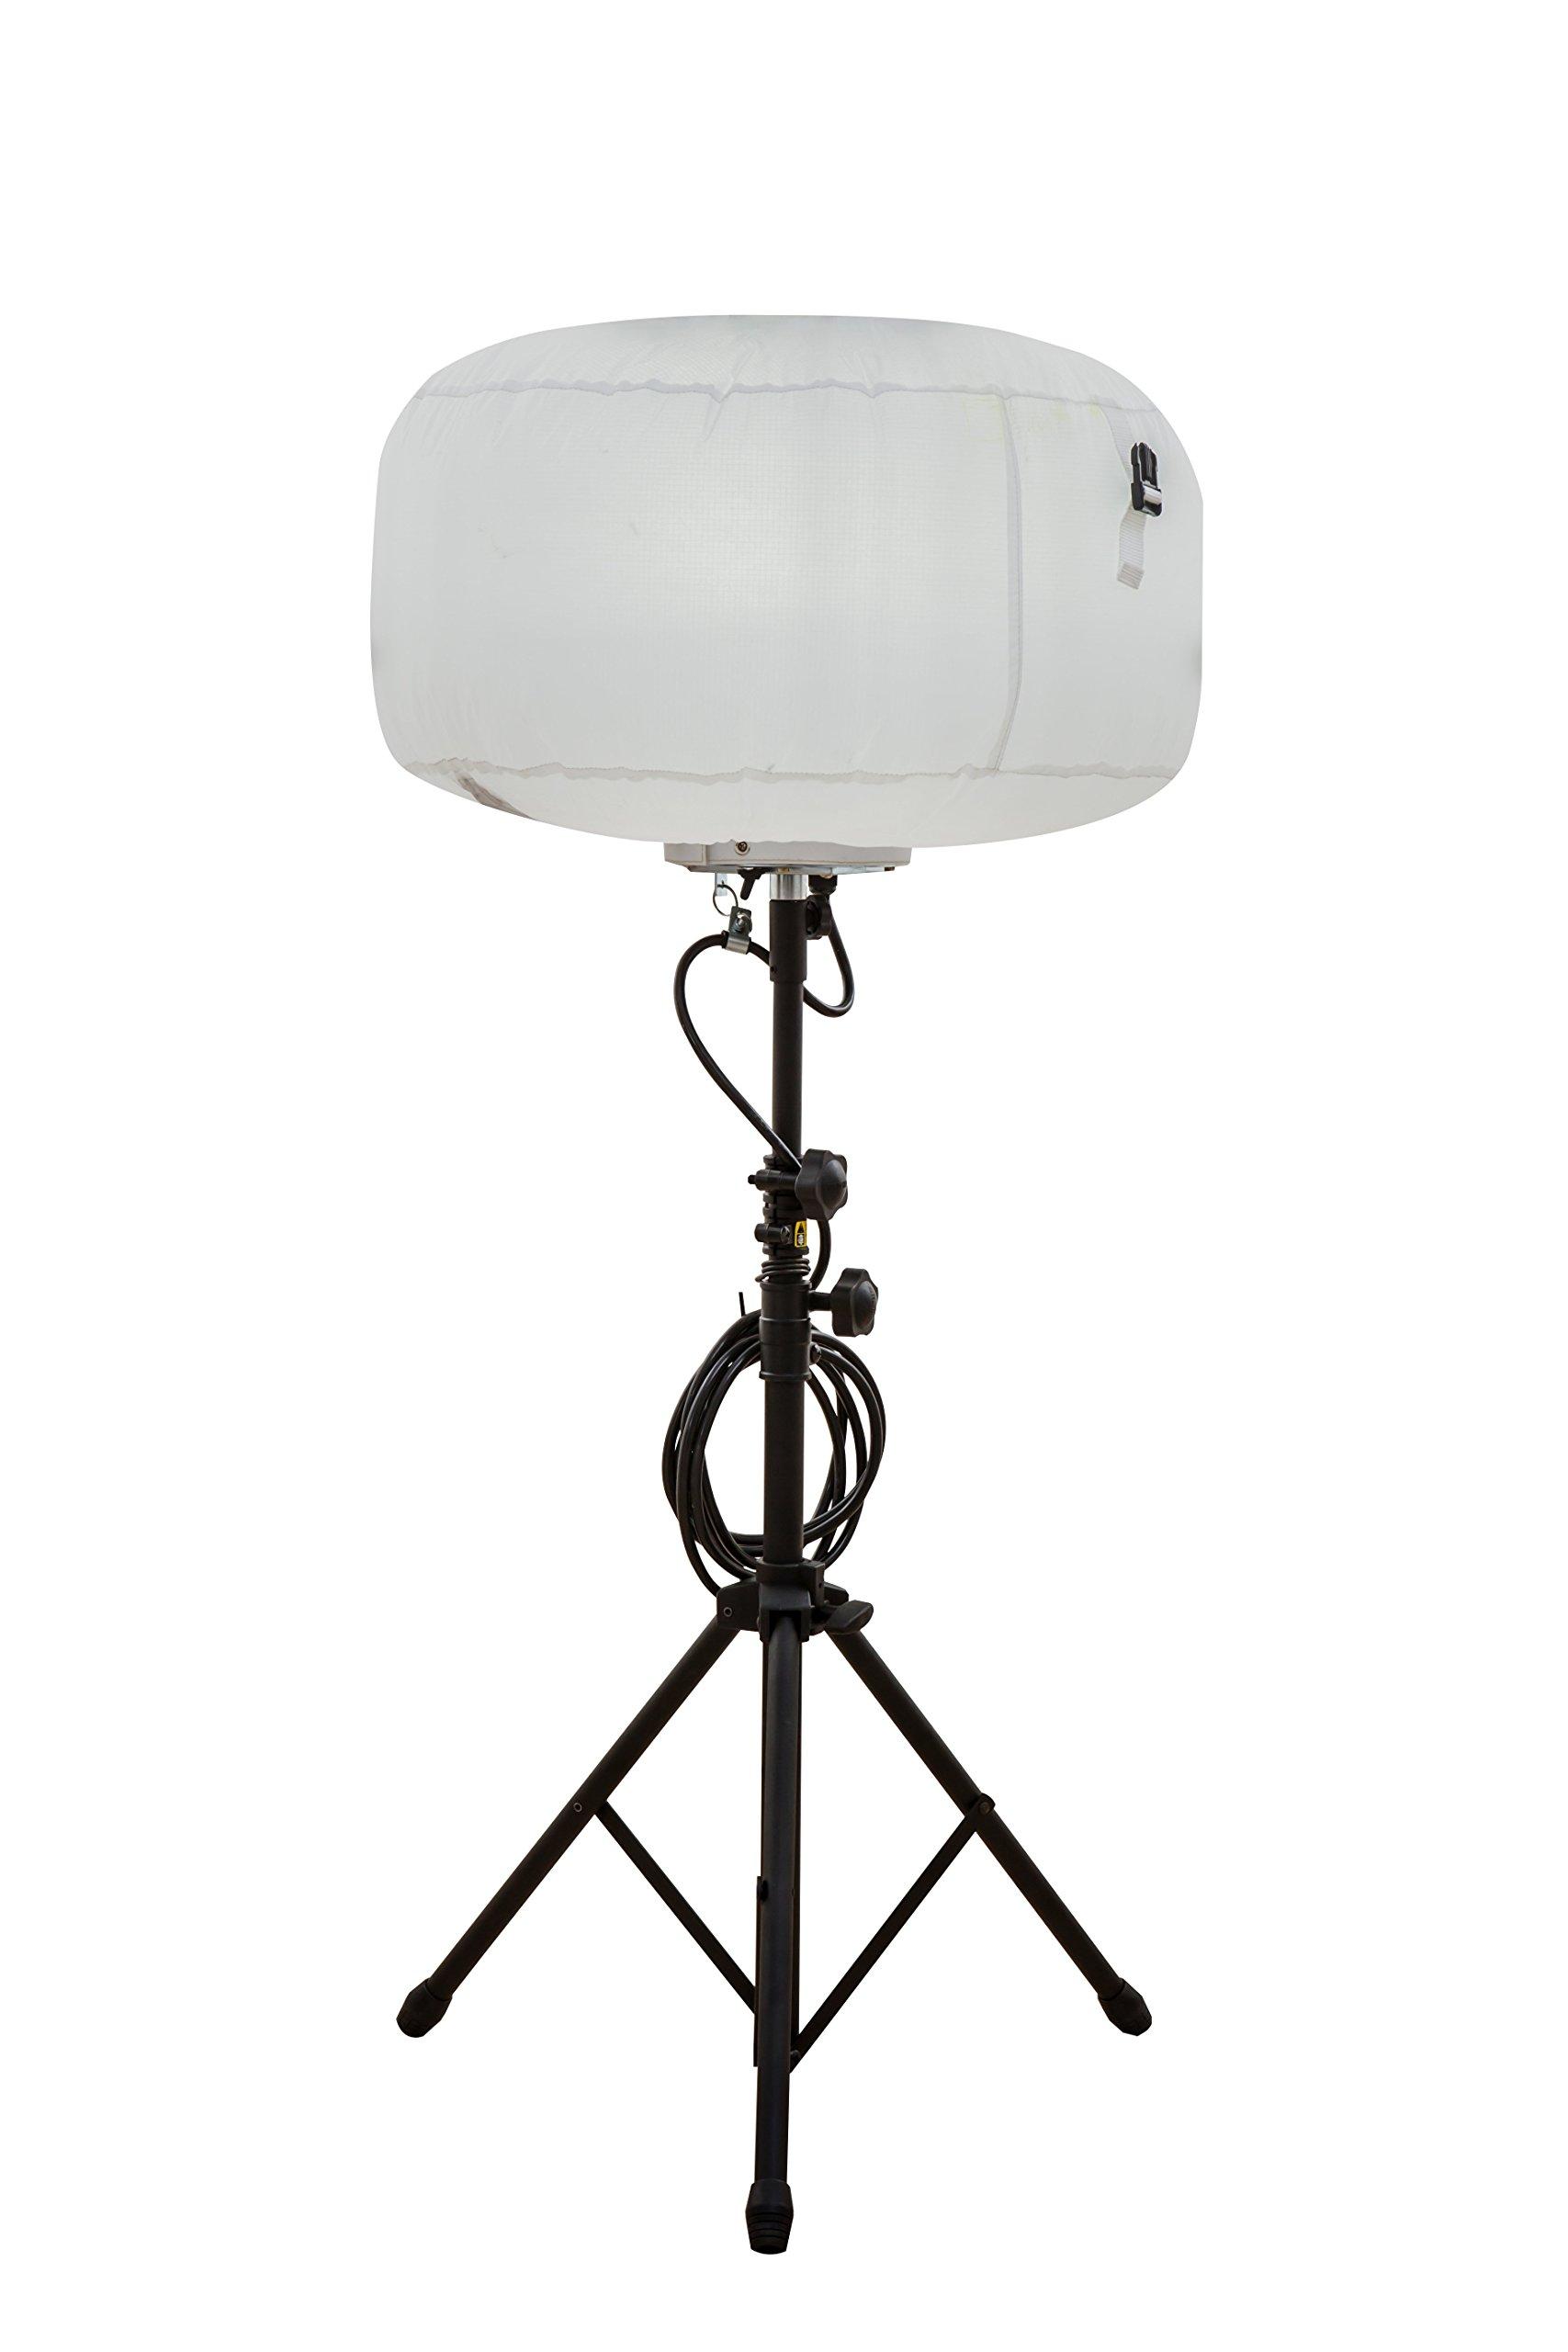 100W LED Balloon Light mini with tripod AC100-240V